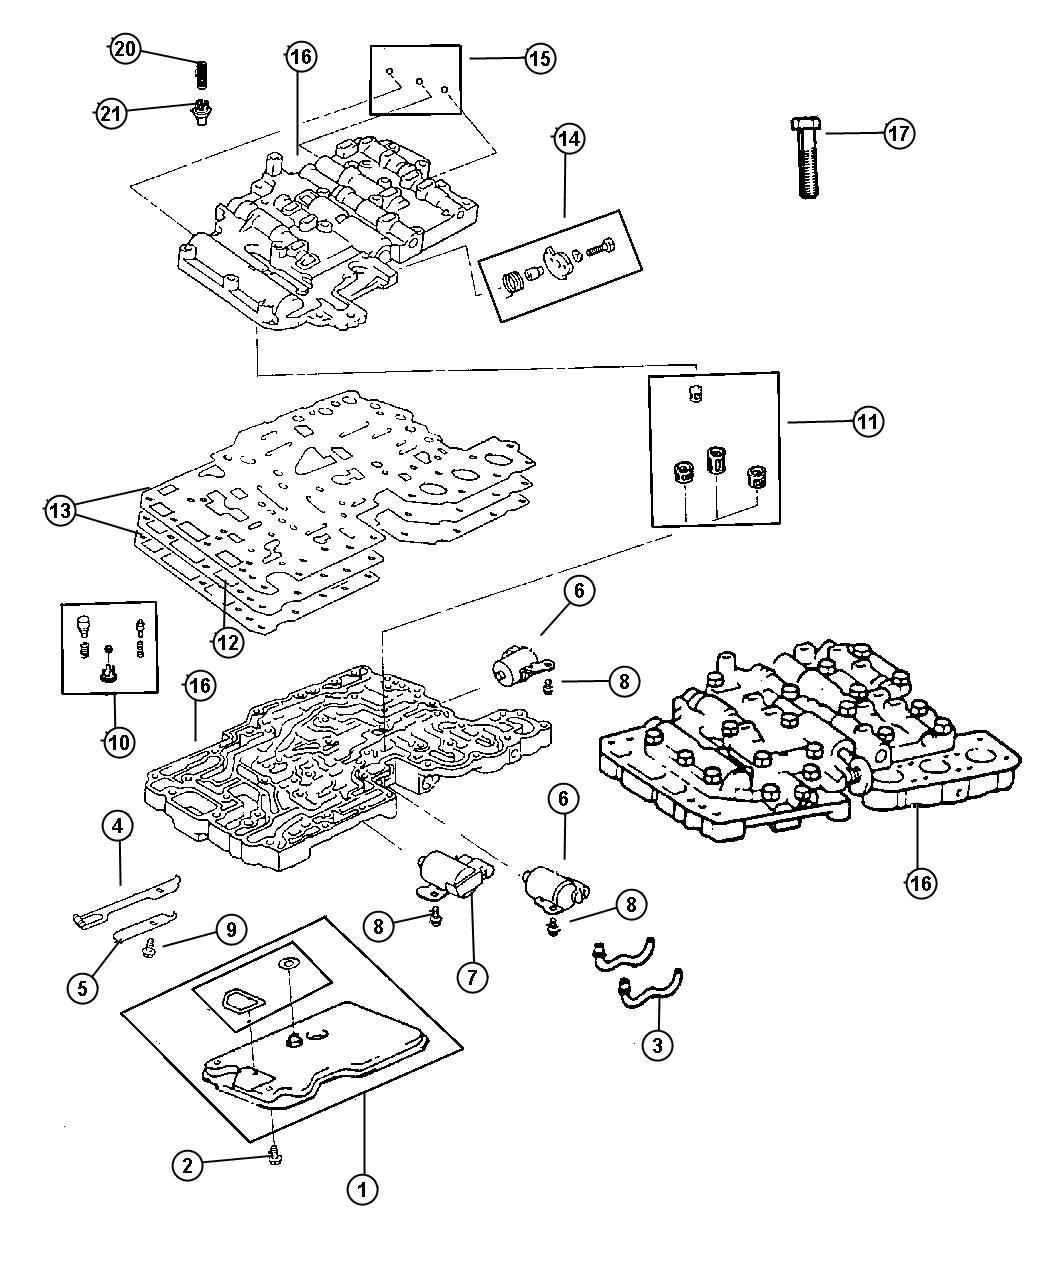 aw4 transmission solenoid wiring diagram